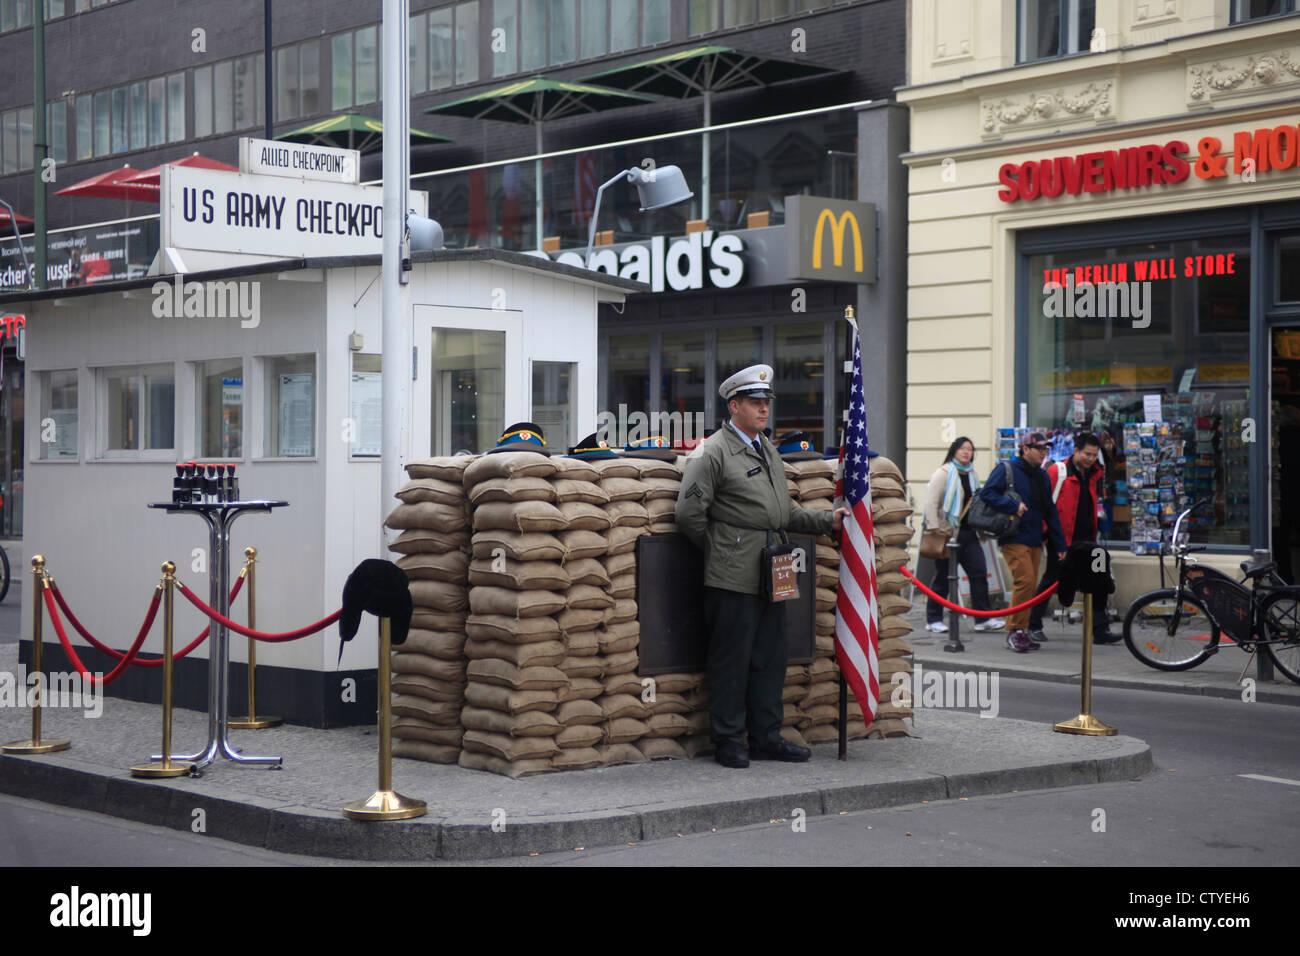 Alemania, Berlín, Checkpoint Charlie Imagen De Stock